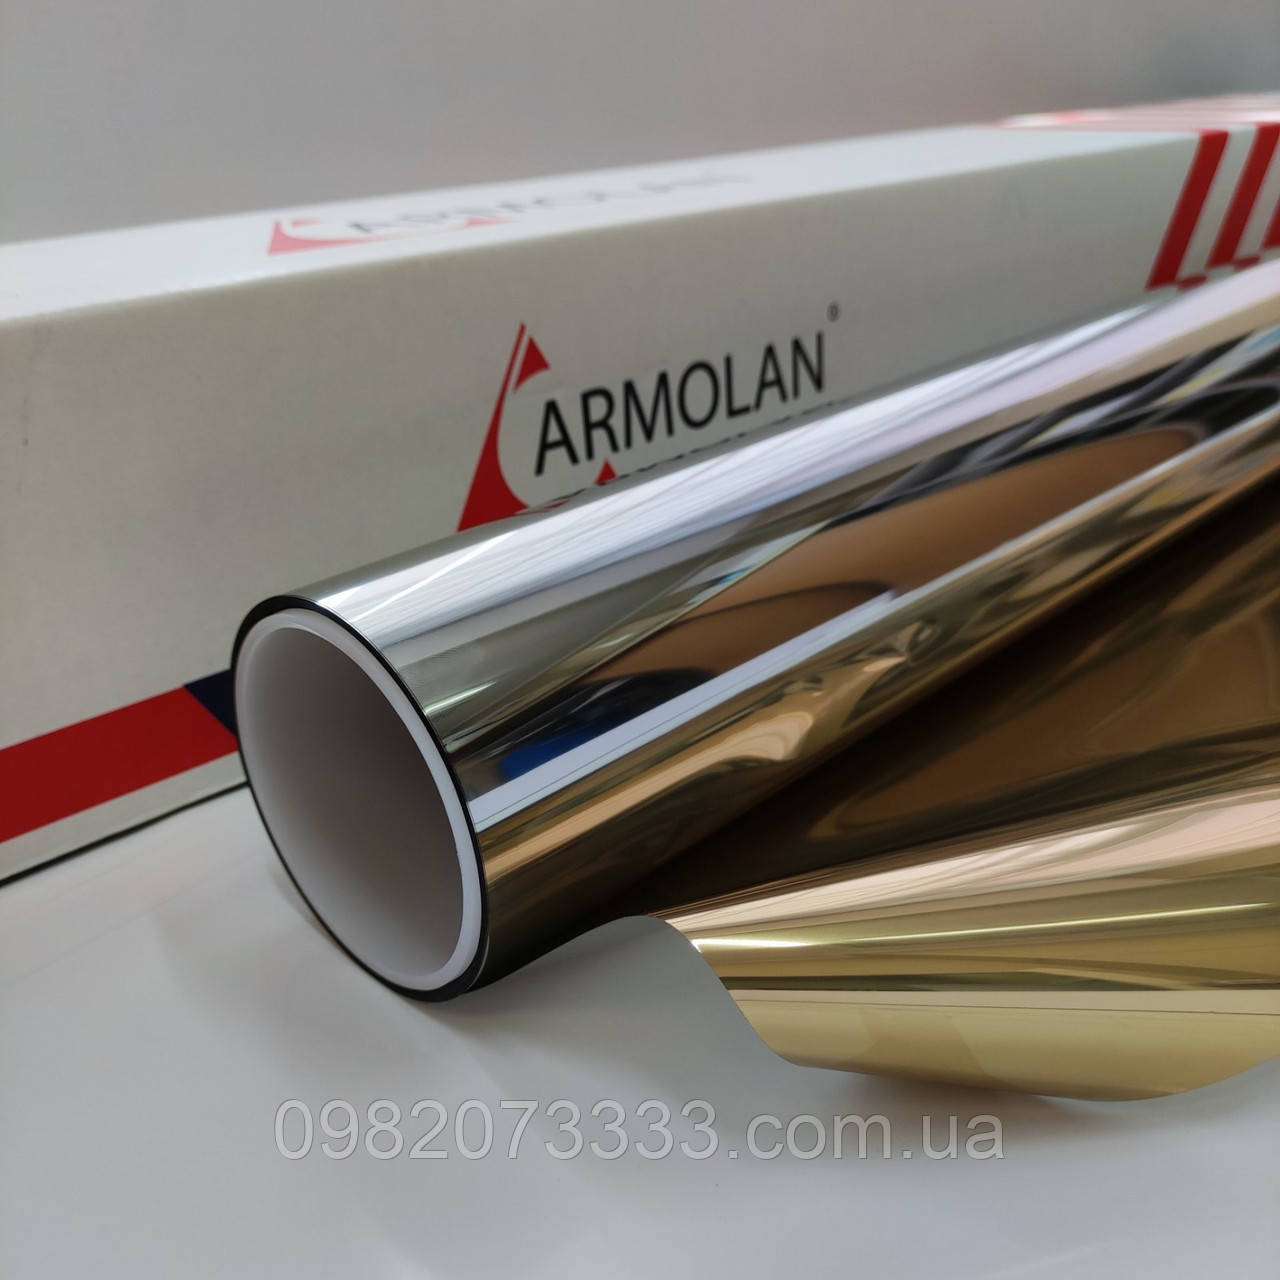 Солнцезащитная пленка R Gold 15 Armolan зеркальная тонировочная для окон. Ширина рулона 1,524 (цена за кв.м)